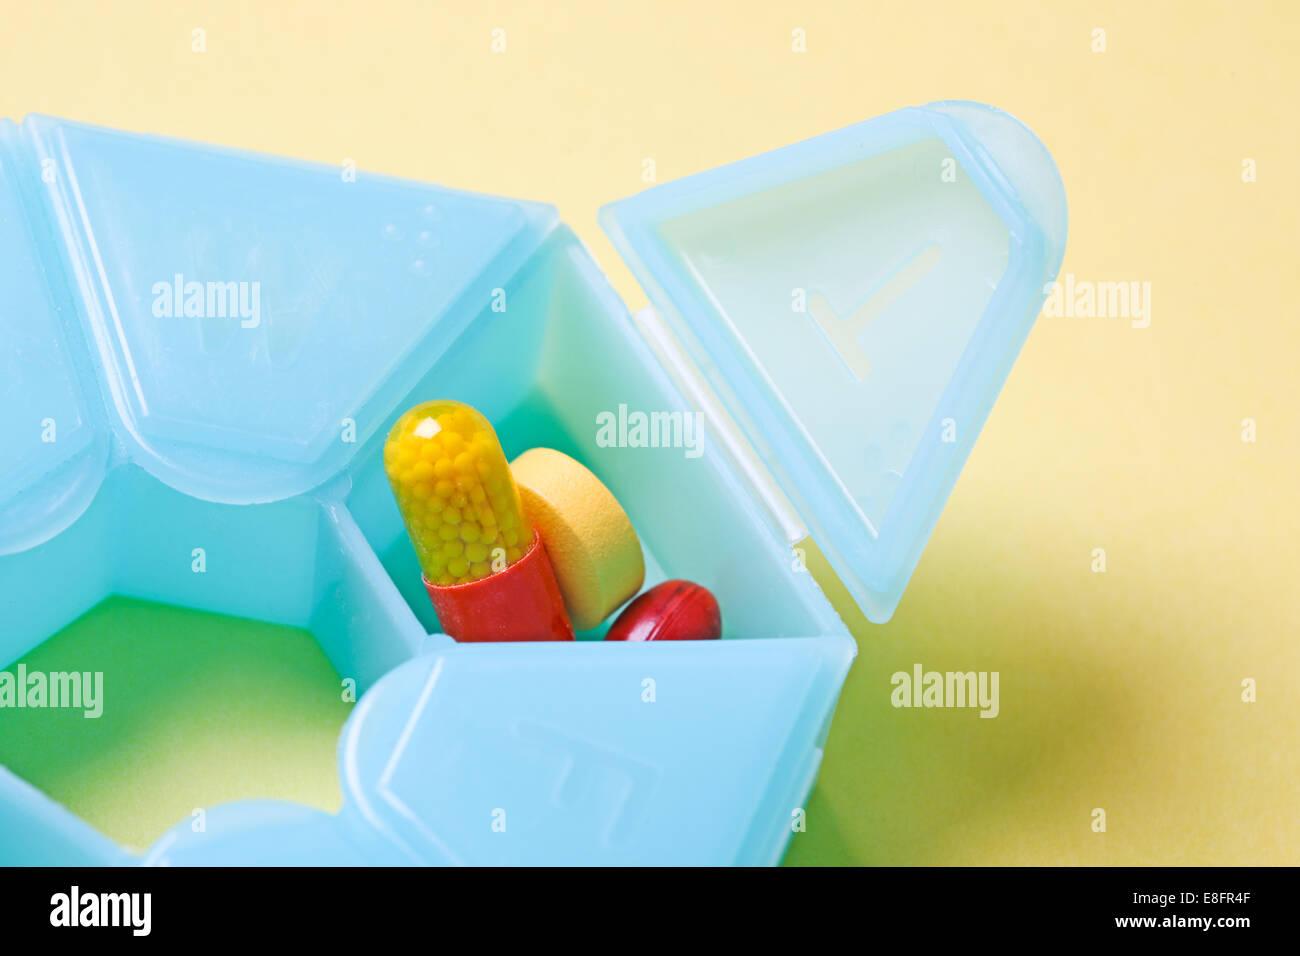 Pills in pill box - Stock Image